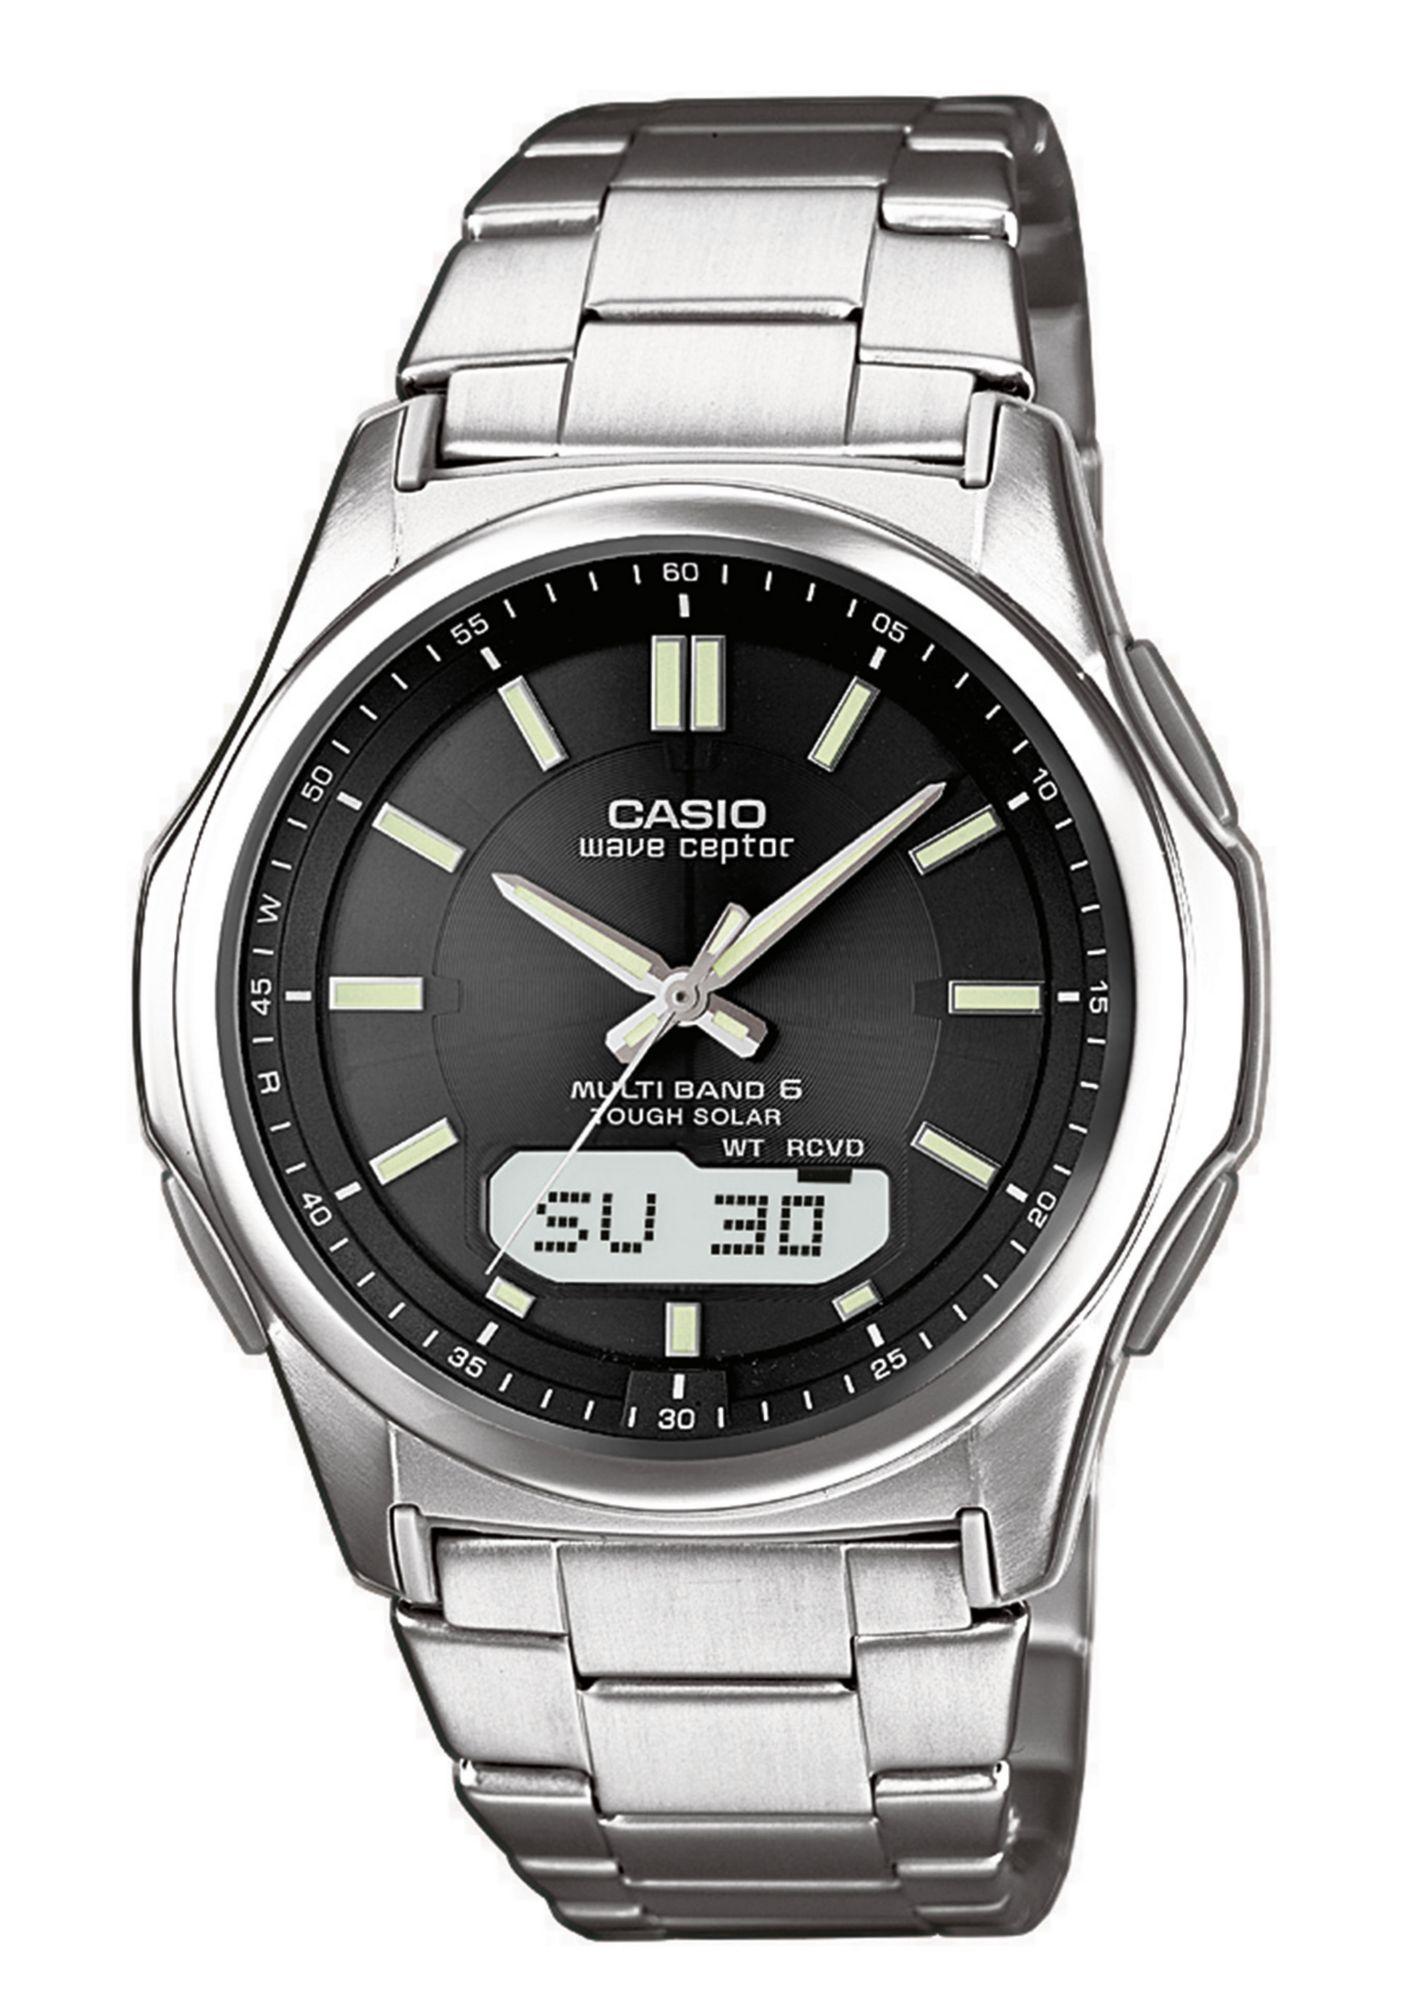 CASIO FUNK Casio Funk Funkchronograph »WVA-M630TD-1AER«